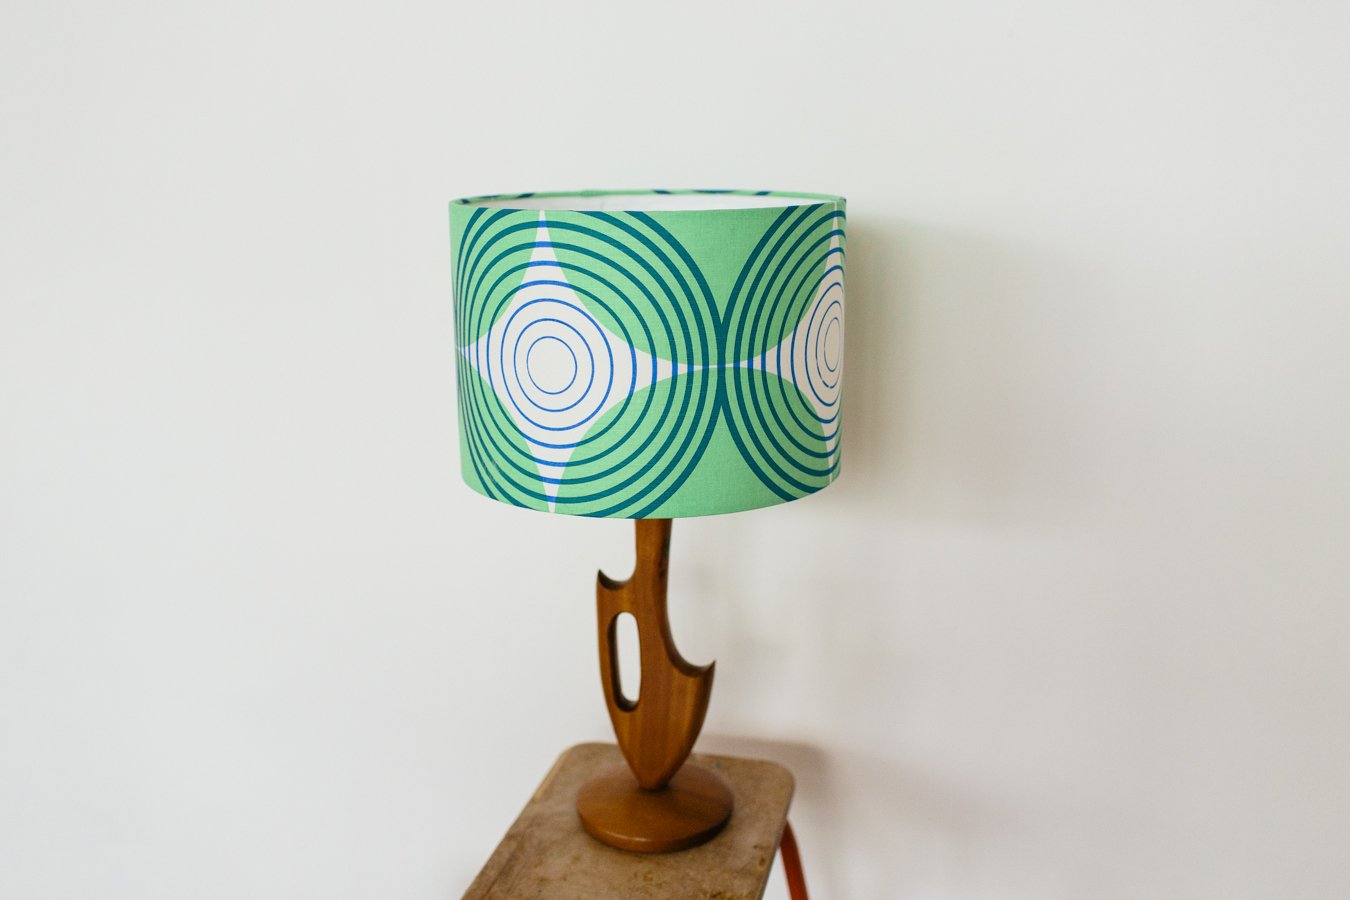 Lauraspring_EYESPOT_lampshade_green_blue_detail_2048x2048.jpg